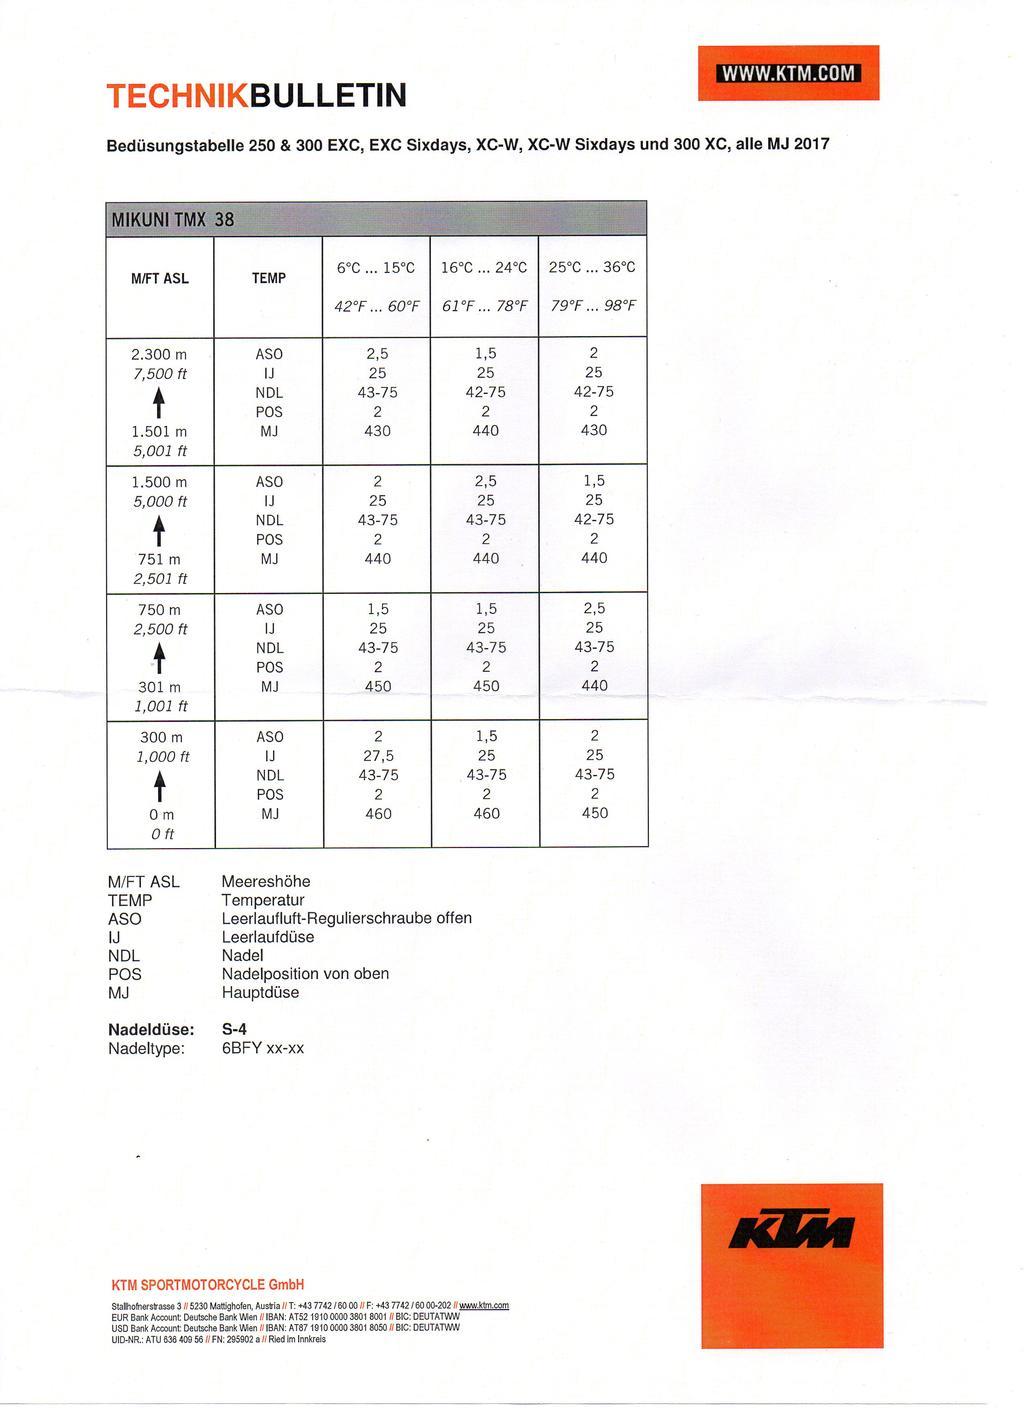 Mikuni Needle Jet Chart